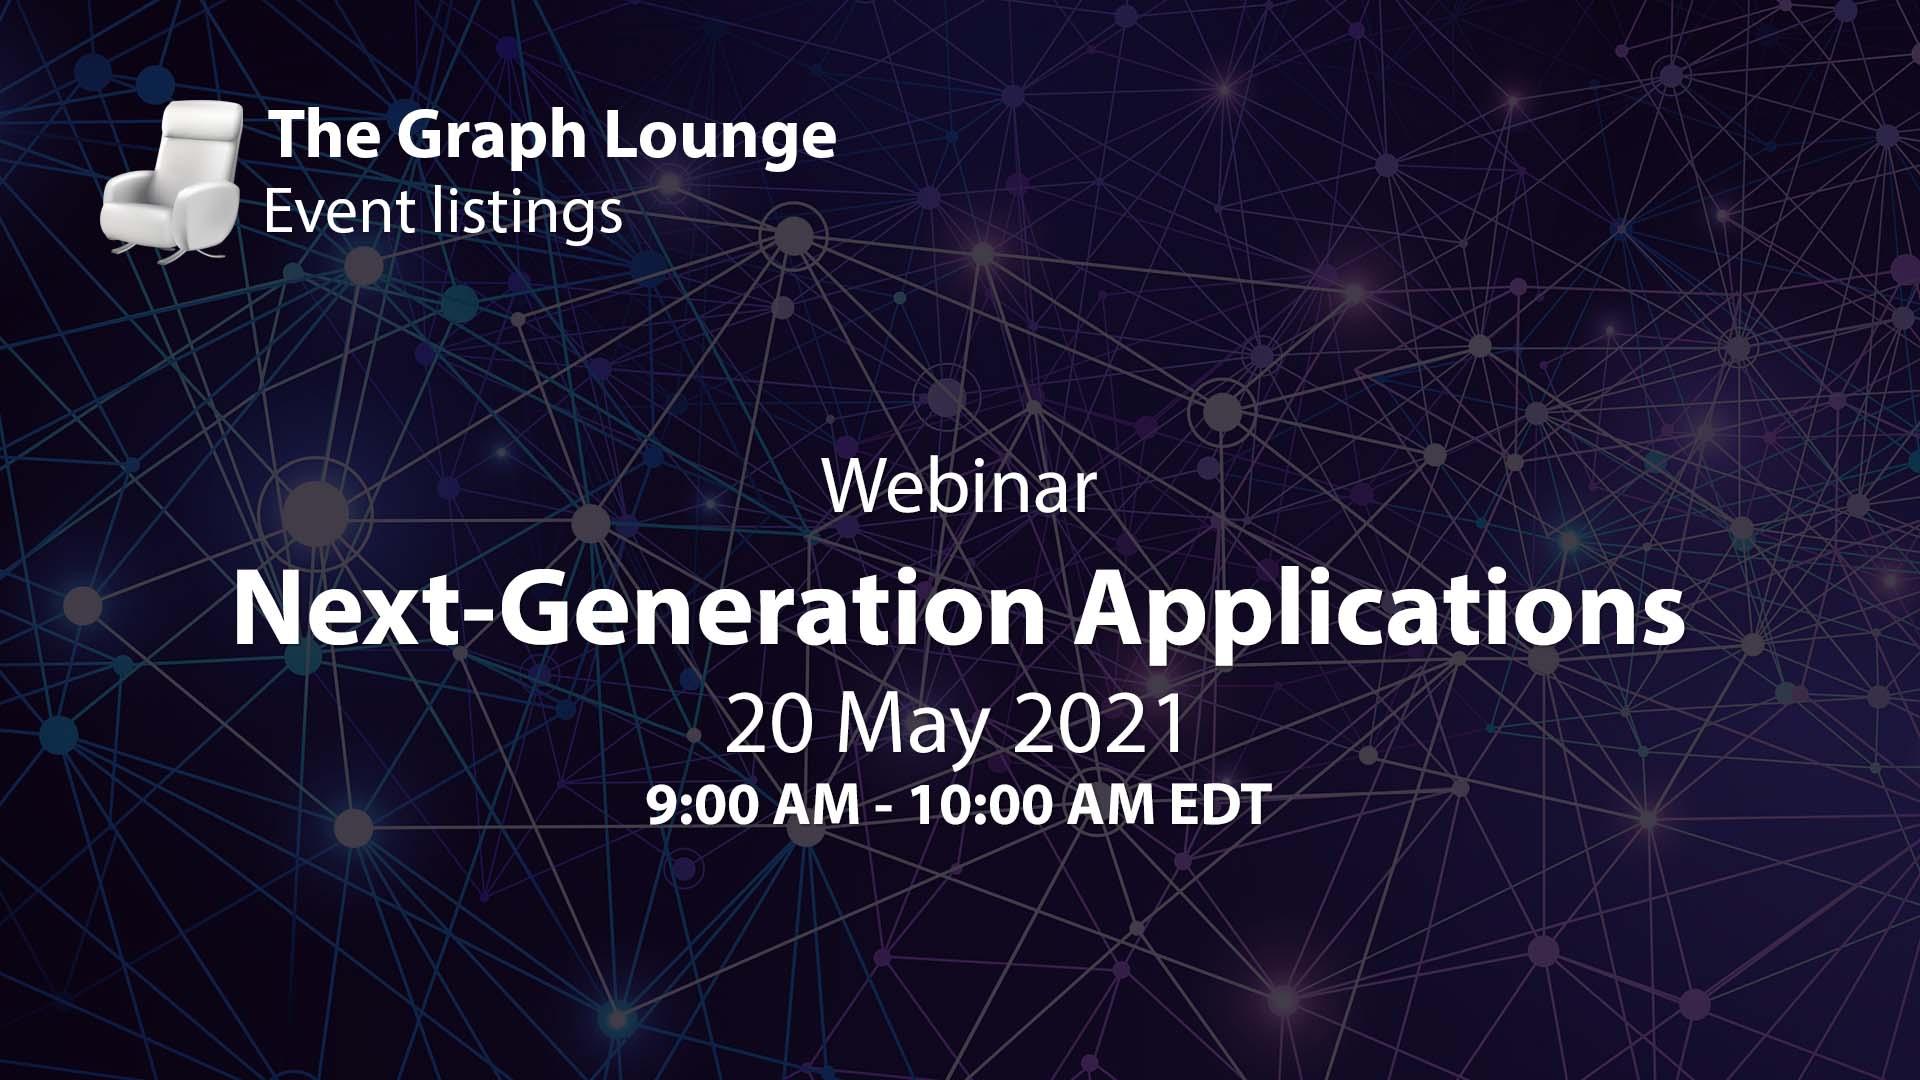 Next-Generation Applications